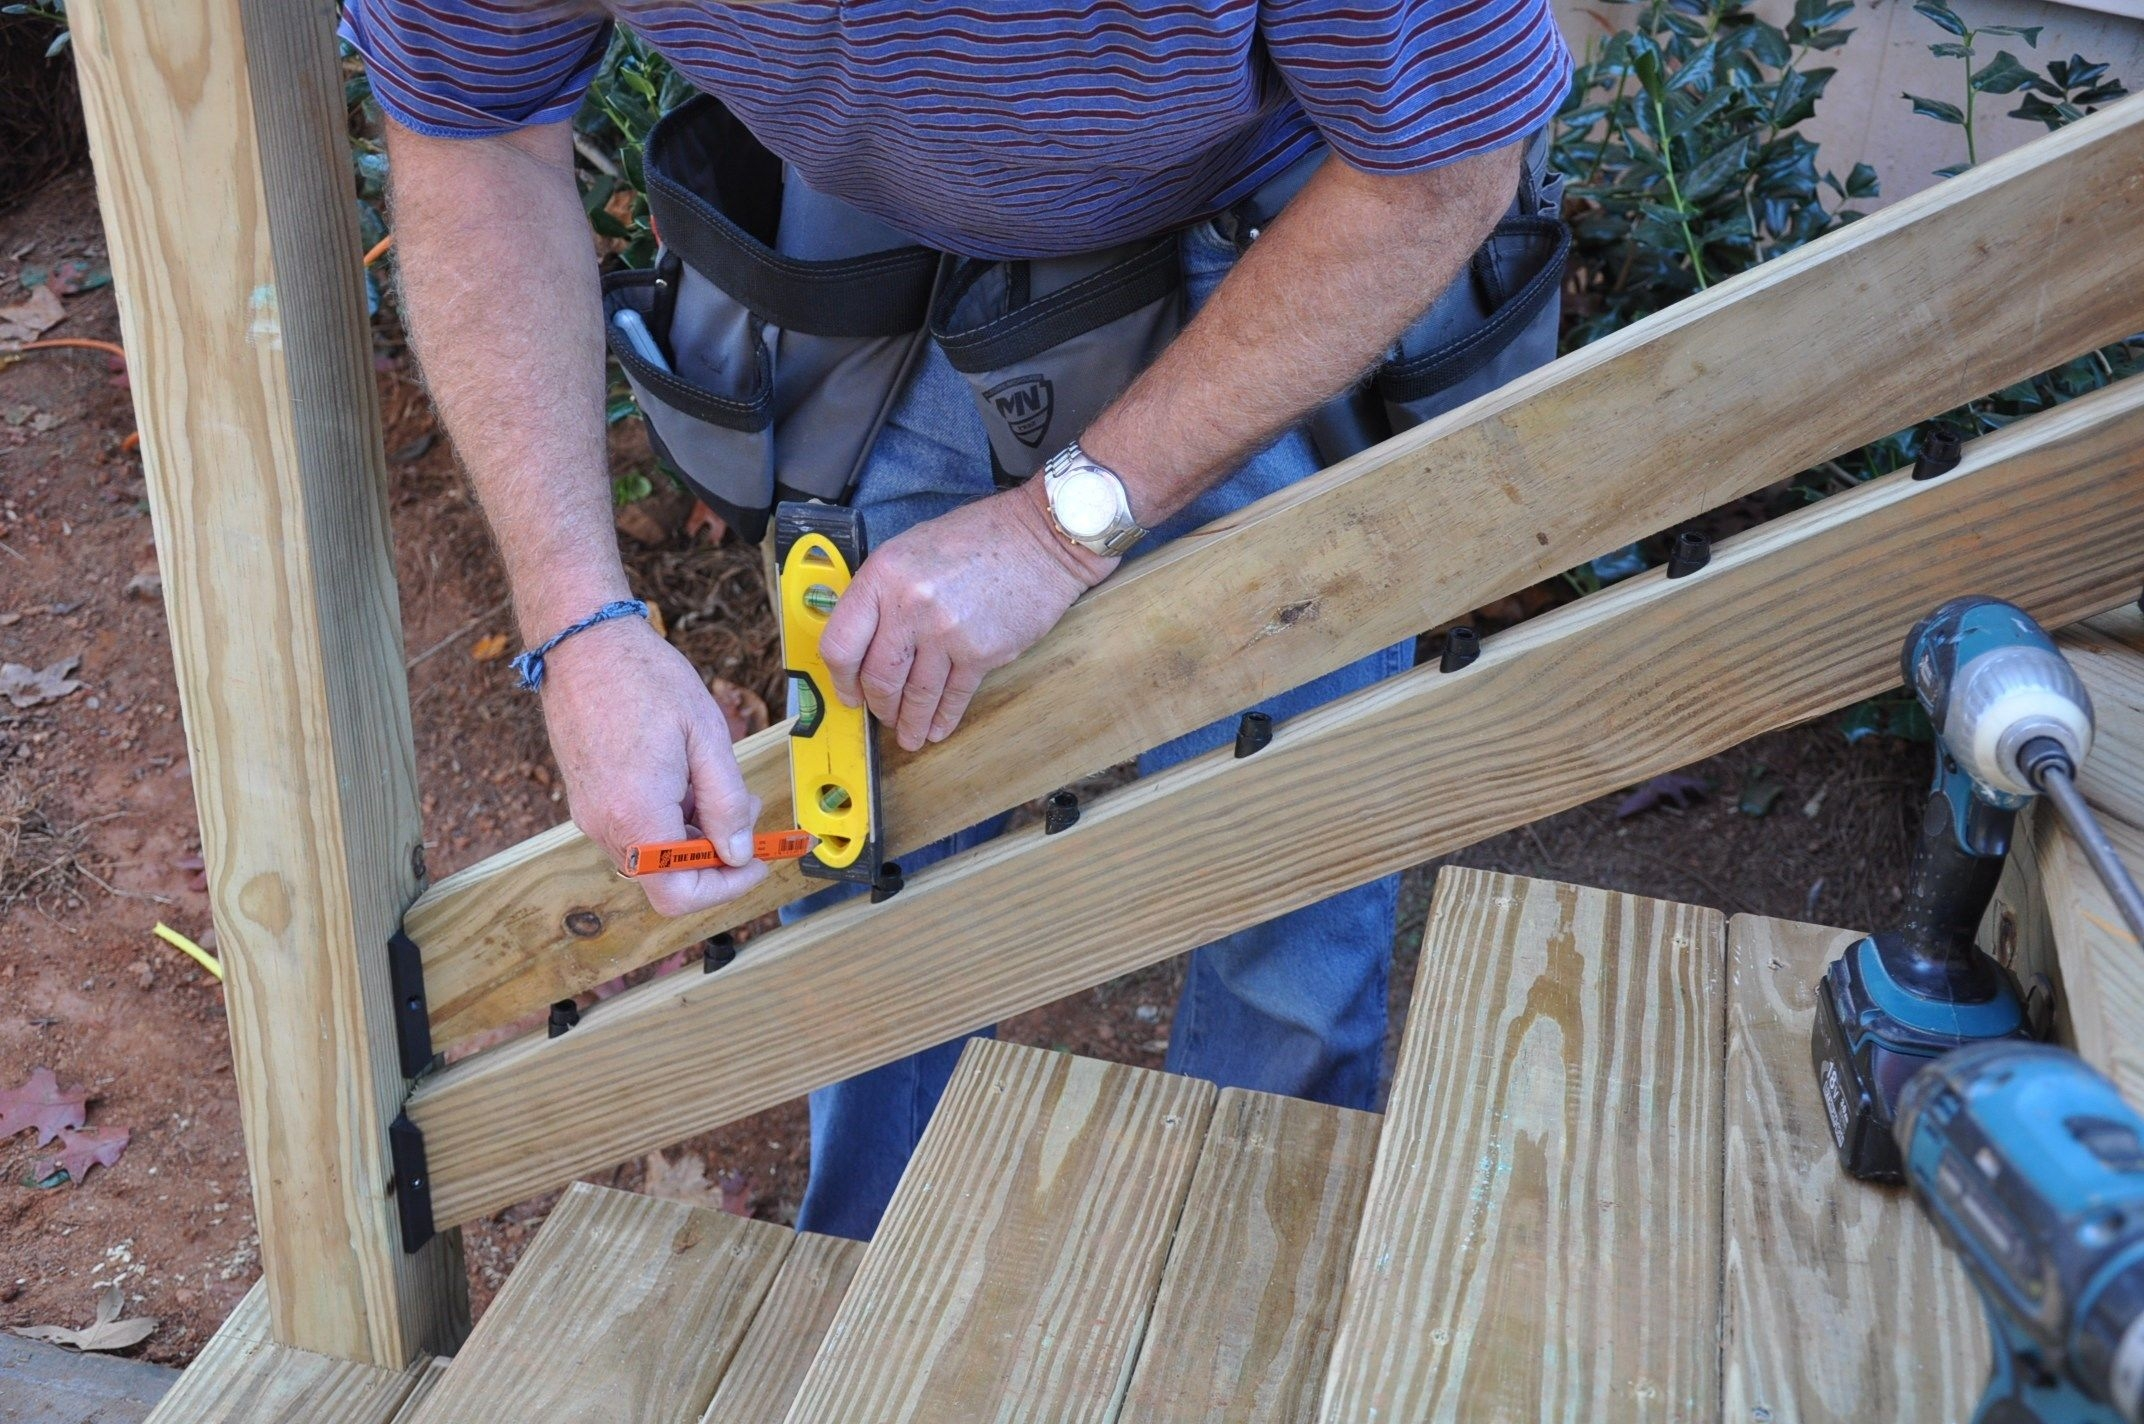 How To Install Deck Stair Railings Decks Com | Installing Deck Stair Railing | Outdoor Stair | Baluster | Railing Ideas | Stair Treads | Stair Stringers